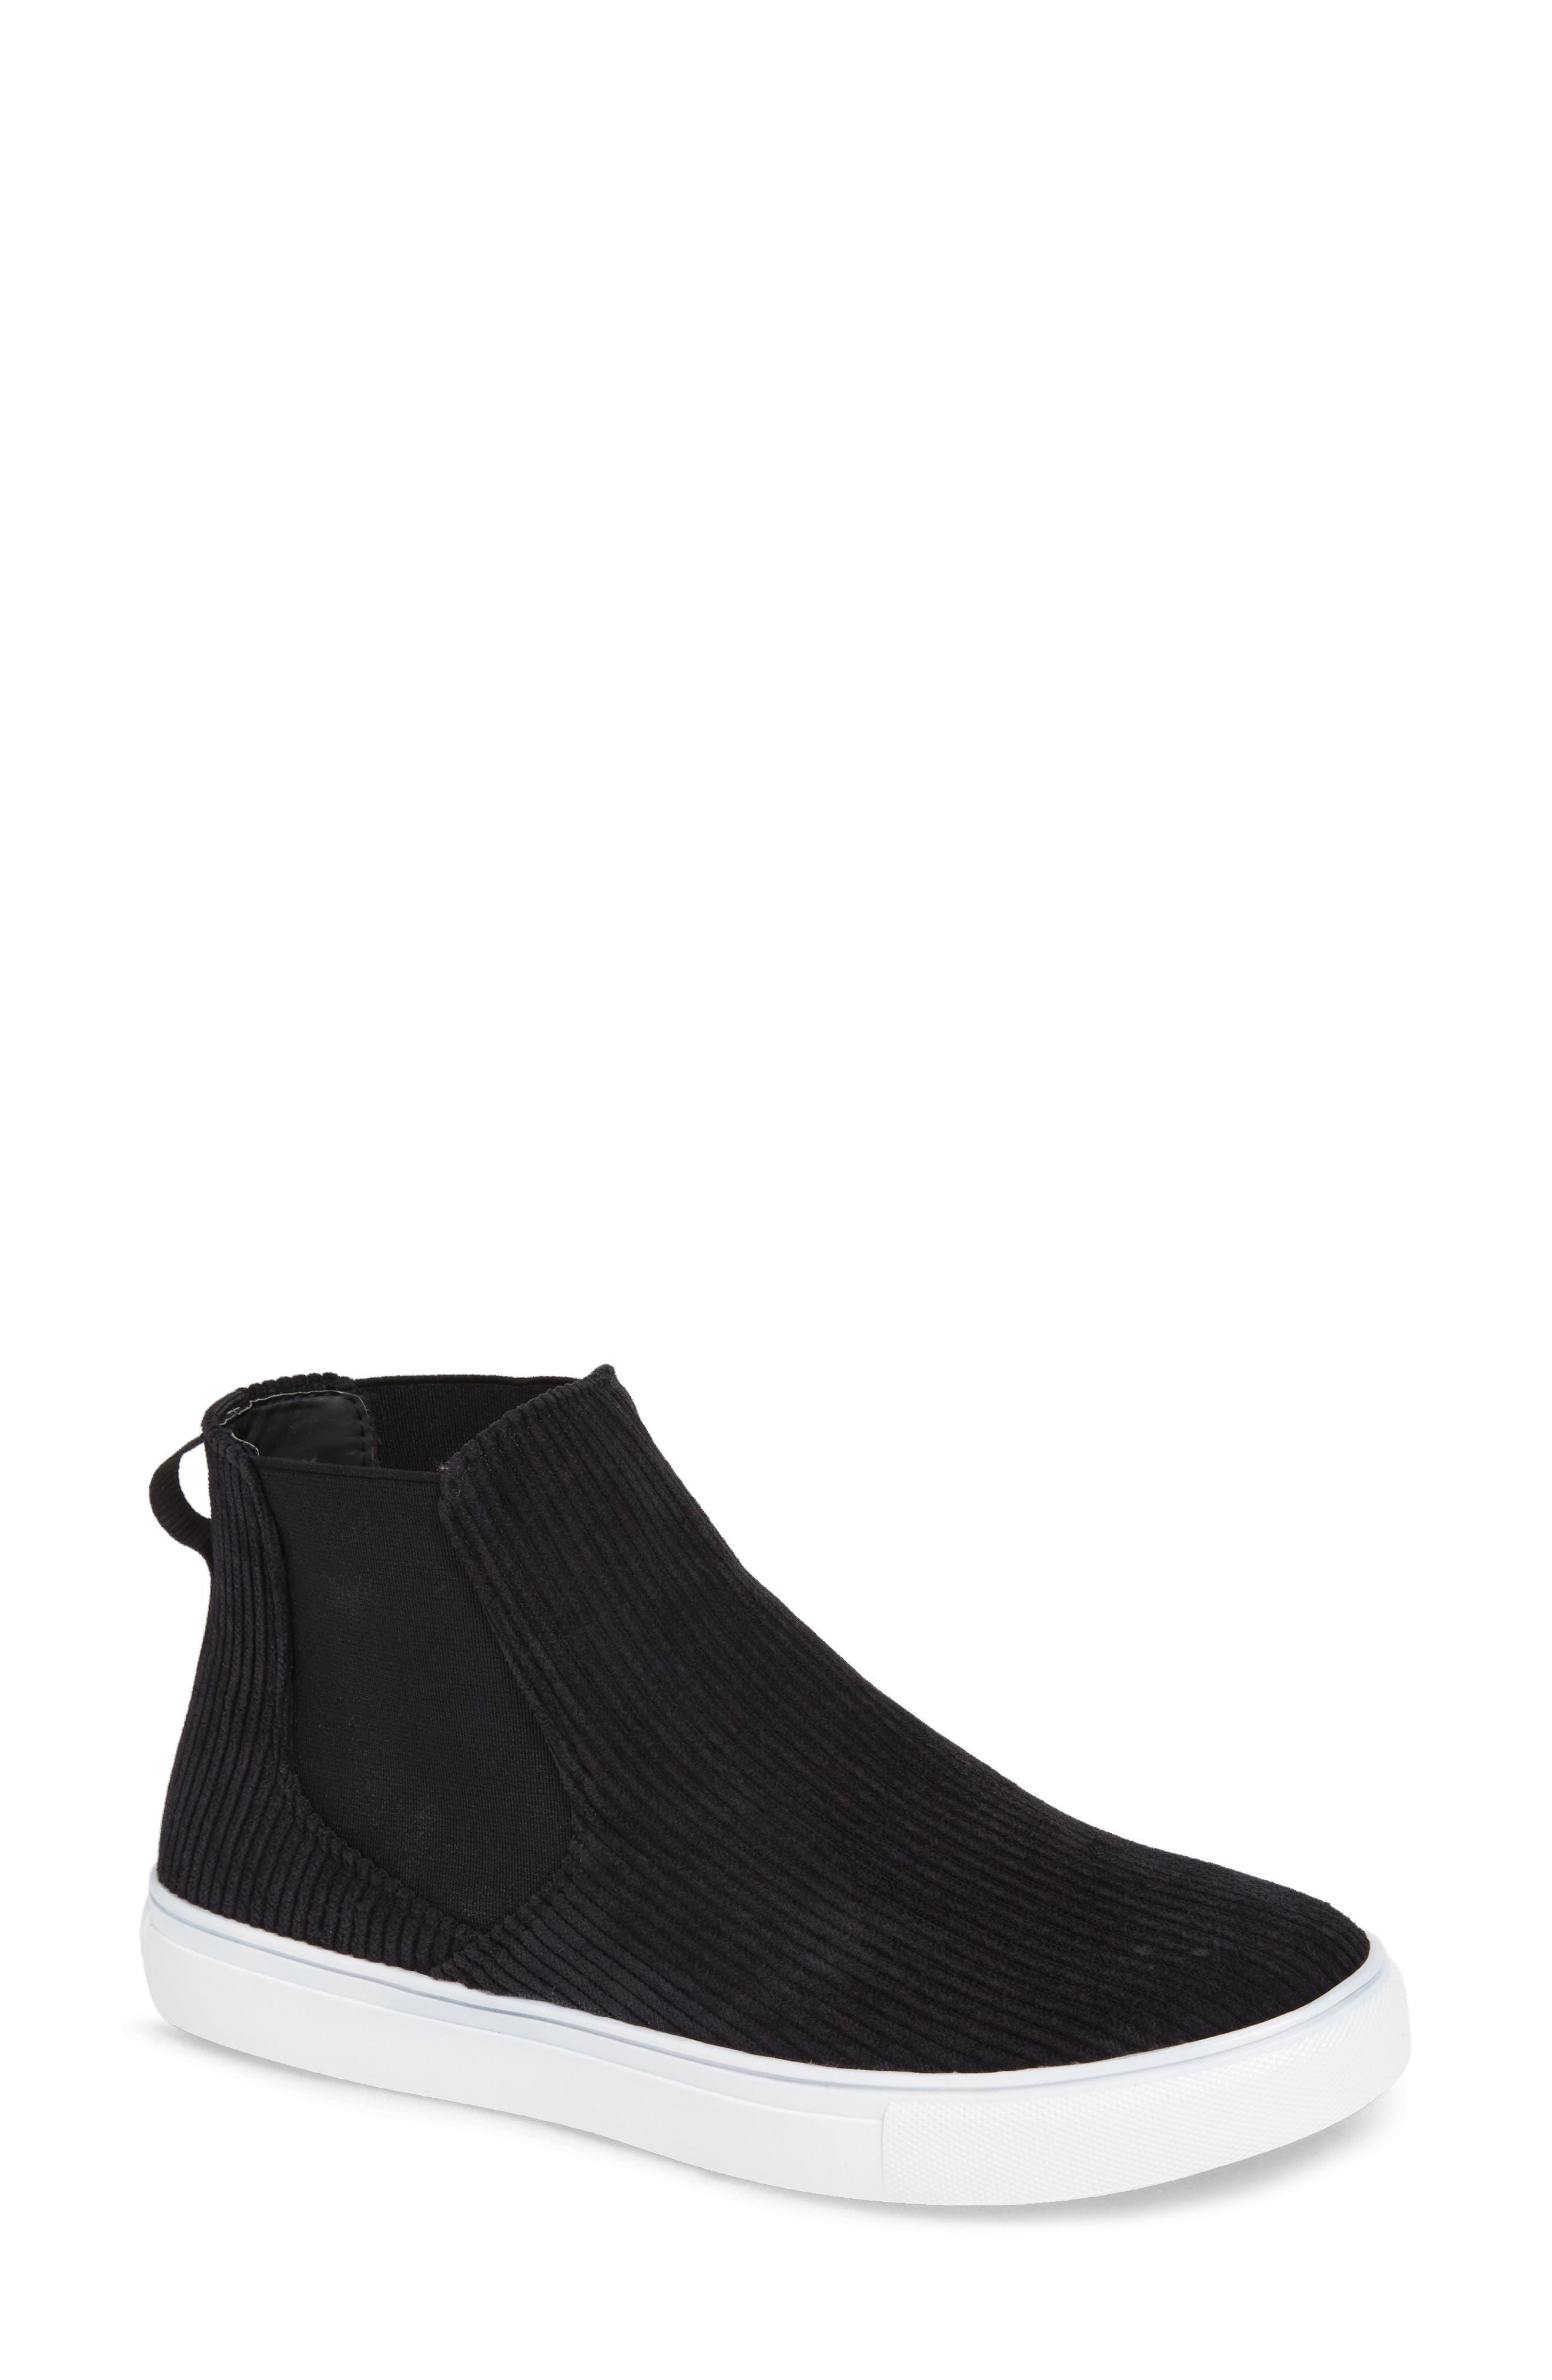 Stratford High Top Sneaker,                             Main thumbnail 1, color,                             BLACK FABRIC